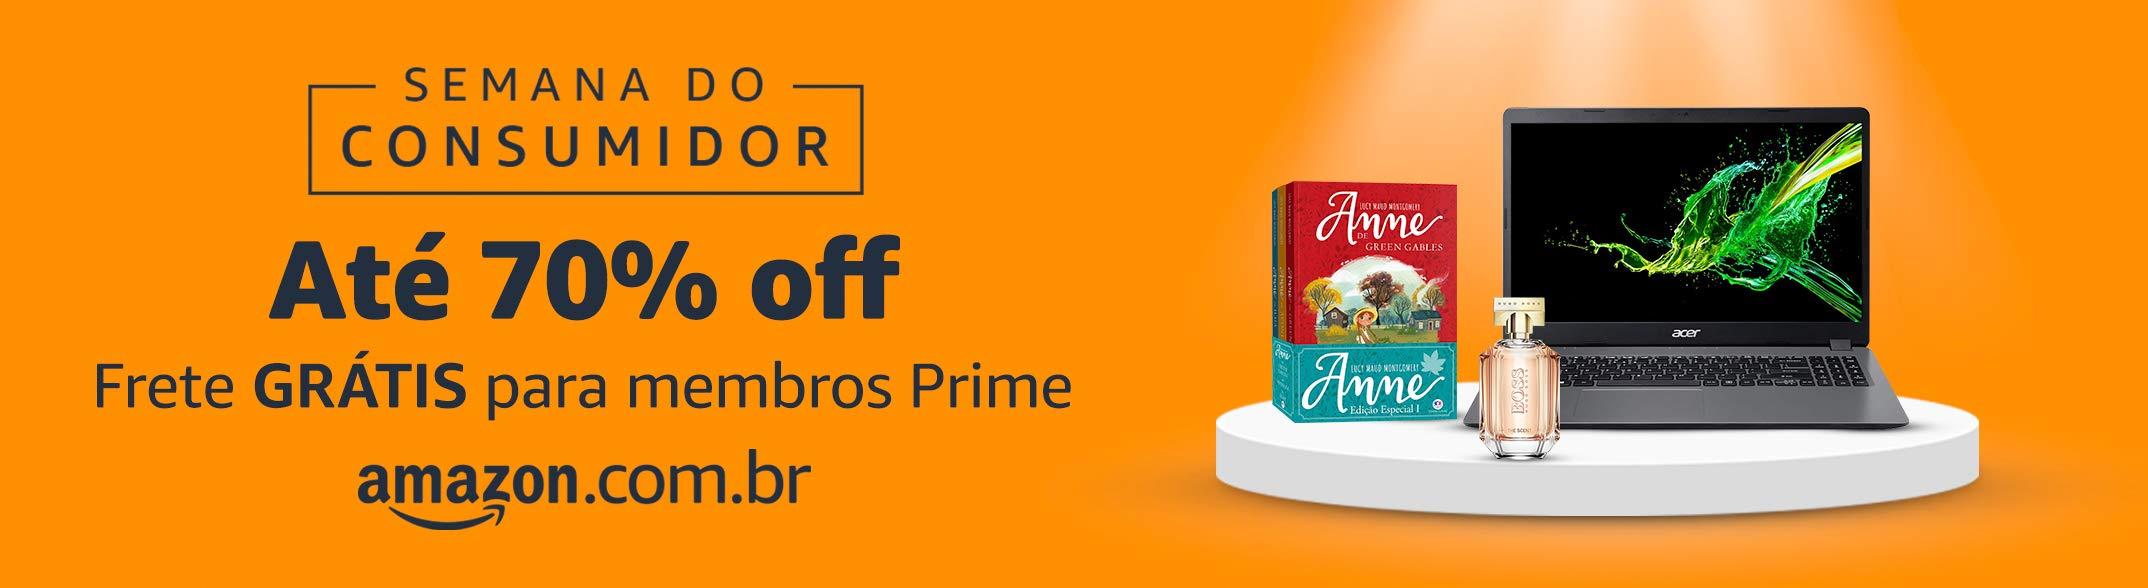 Semana do Consumidor Amazon